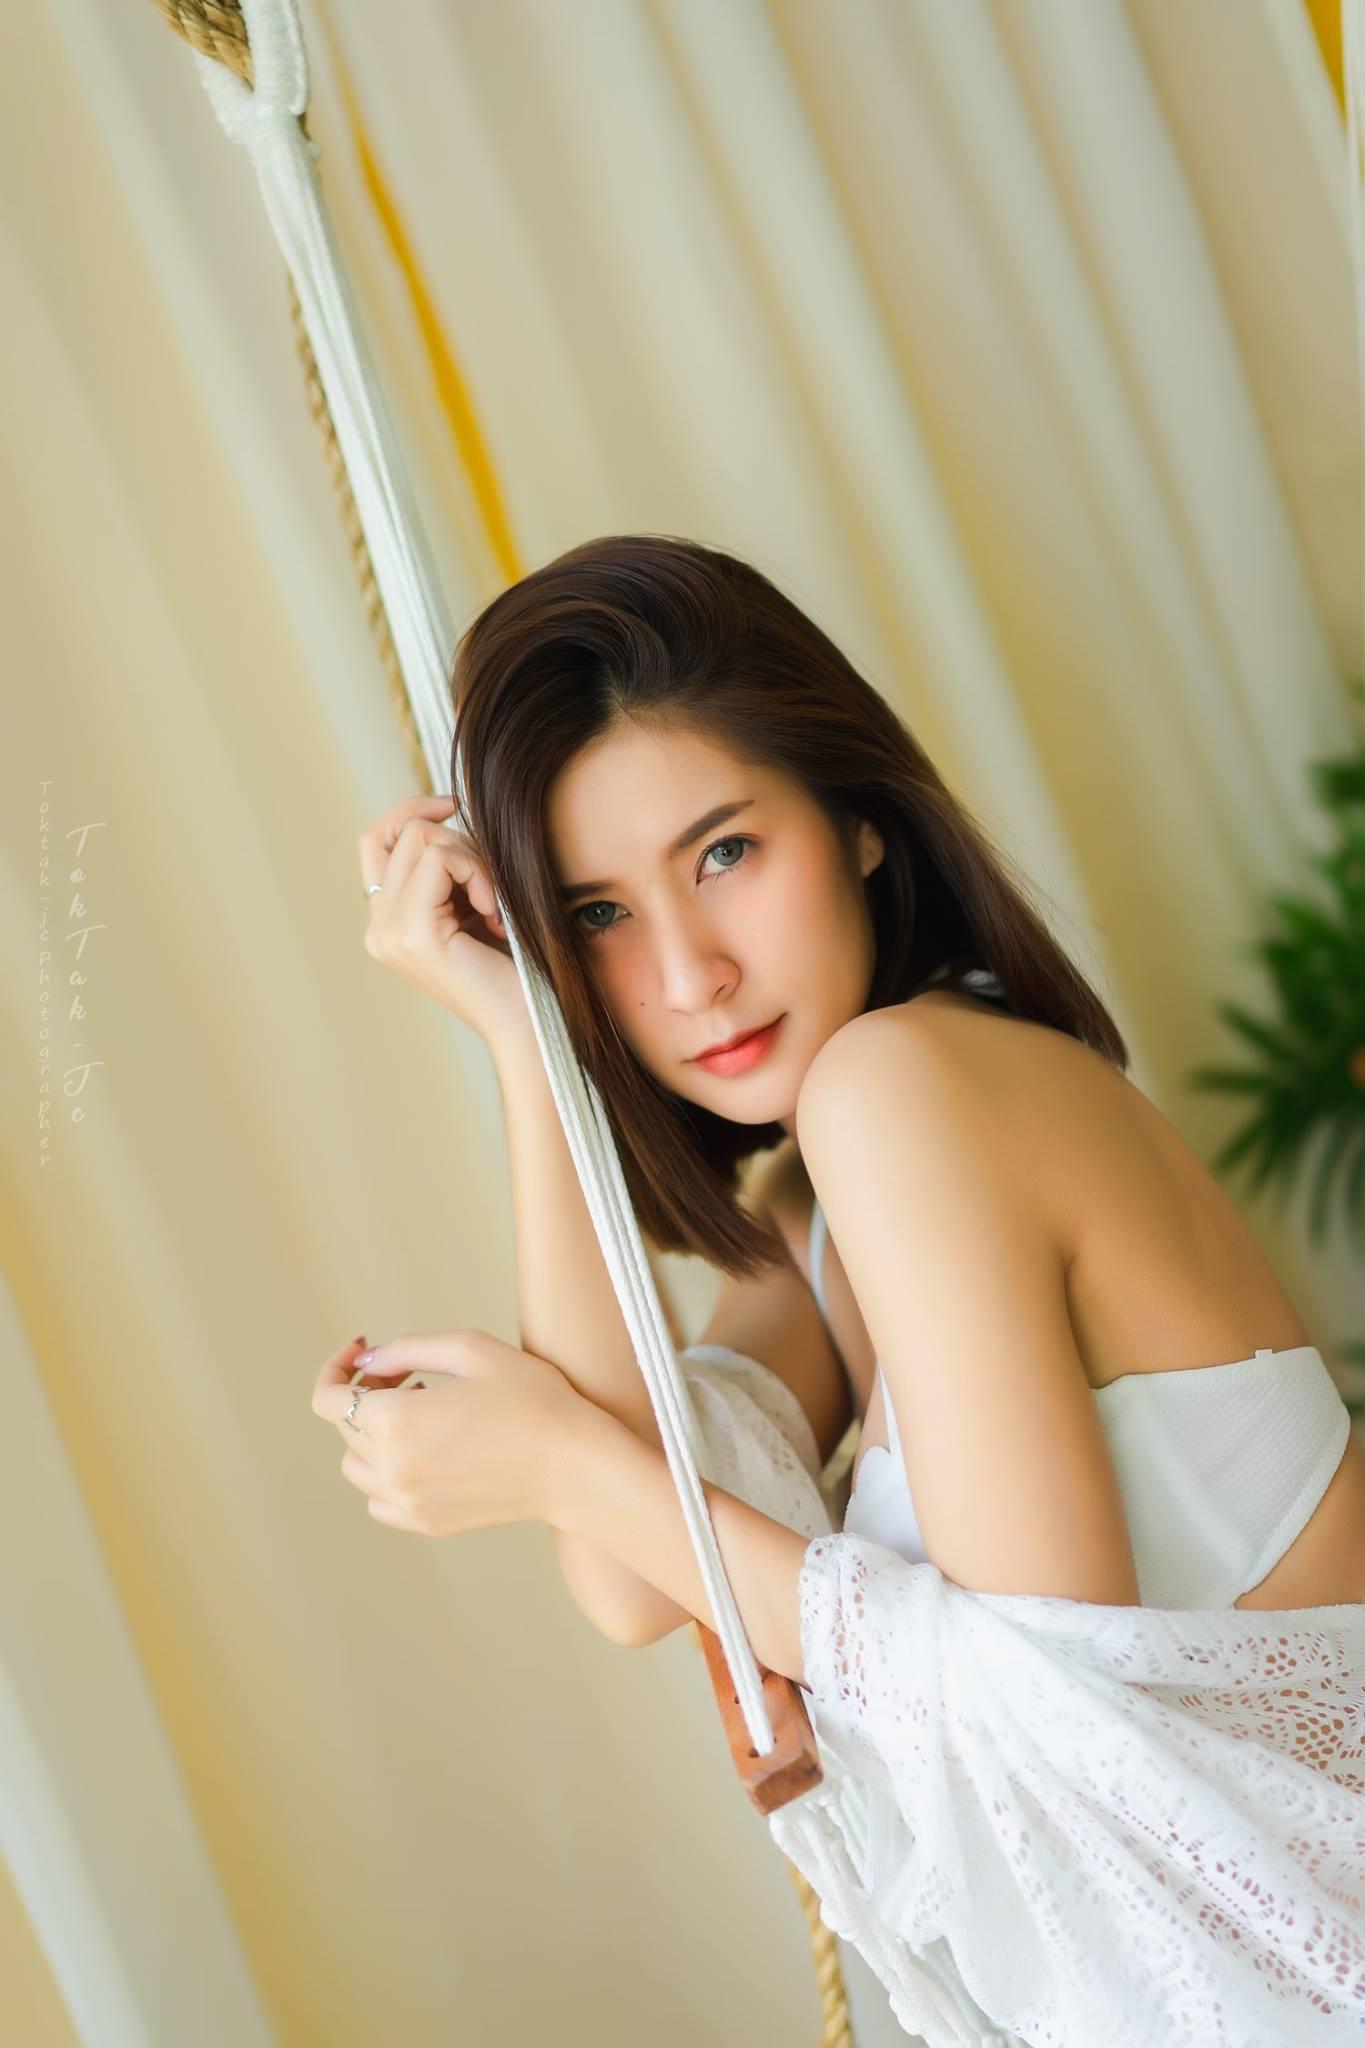 Swing - Thanyarath Sriudomloert